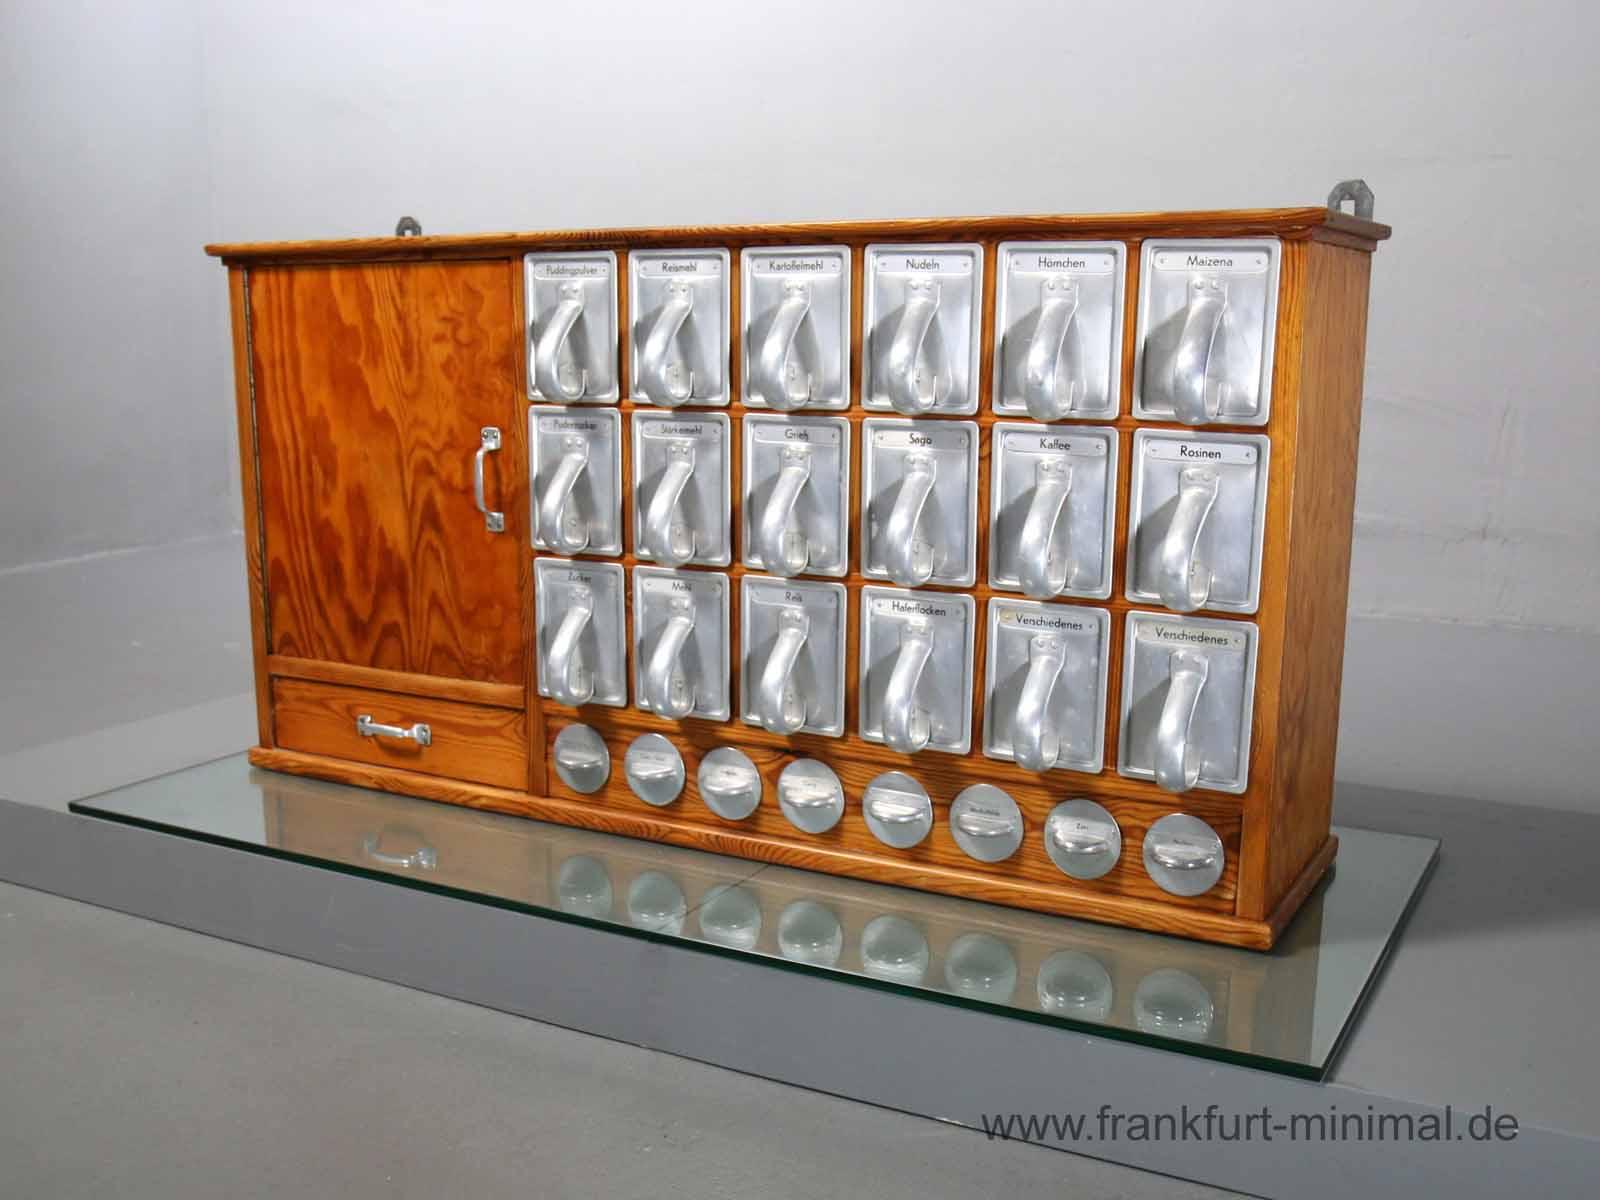 Produktdetails - frankfurt minimal - 19th century furniture